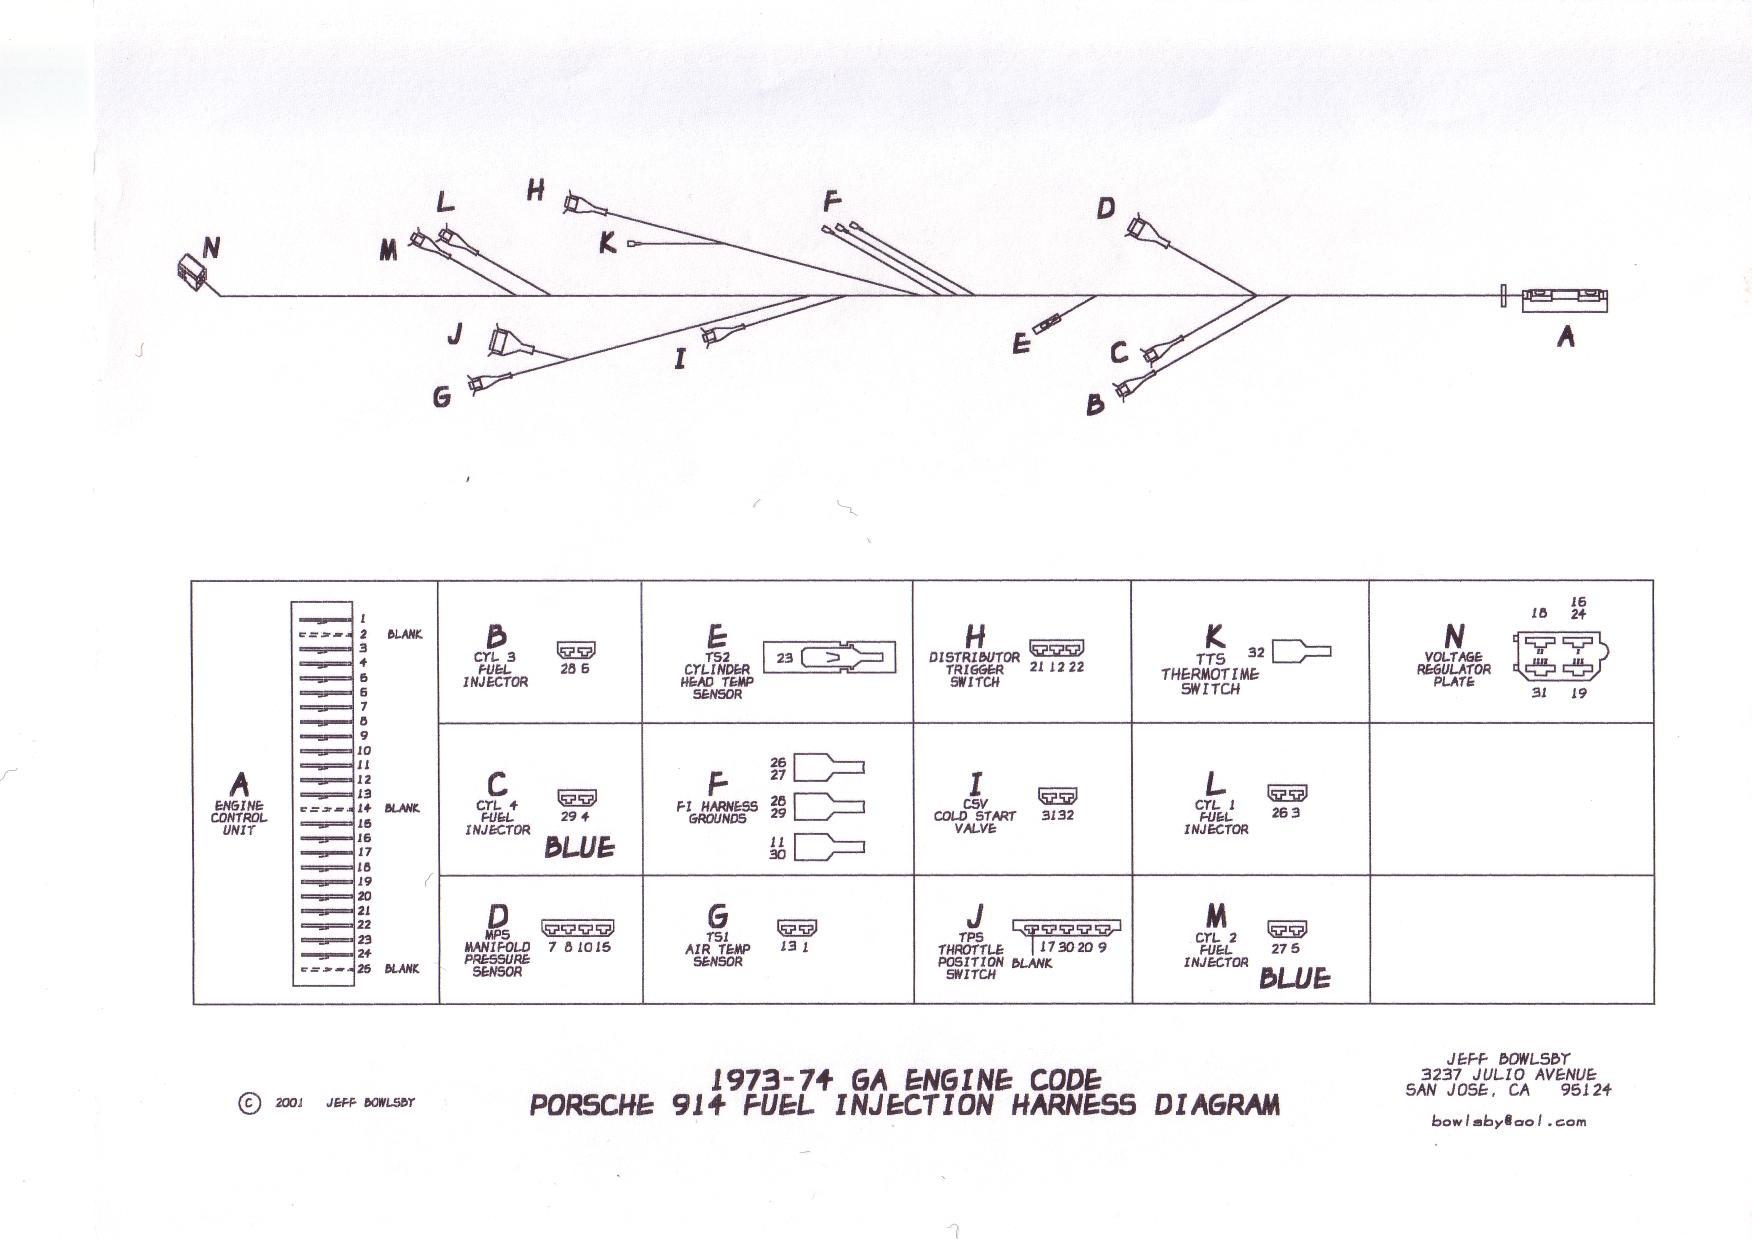 1971 porsche 914 wiring diagram horizon soil formation schematics, diagrams and shop drawings. - page 3 shoptalkforums.com